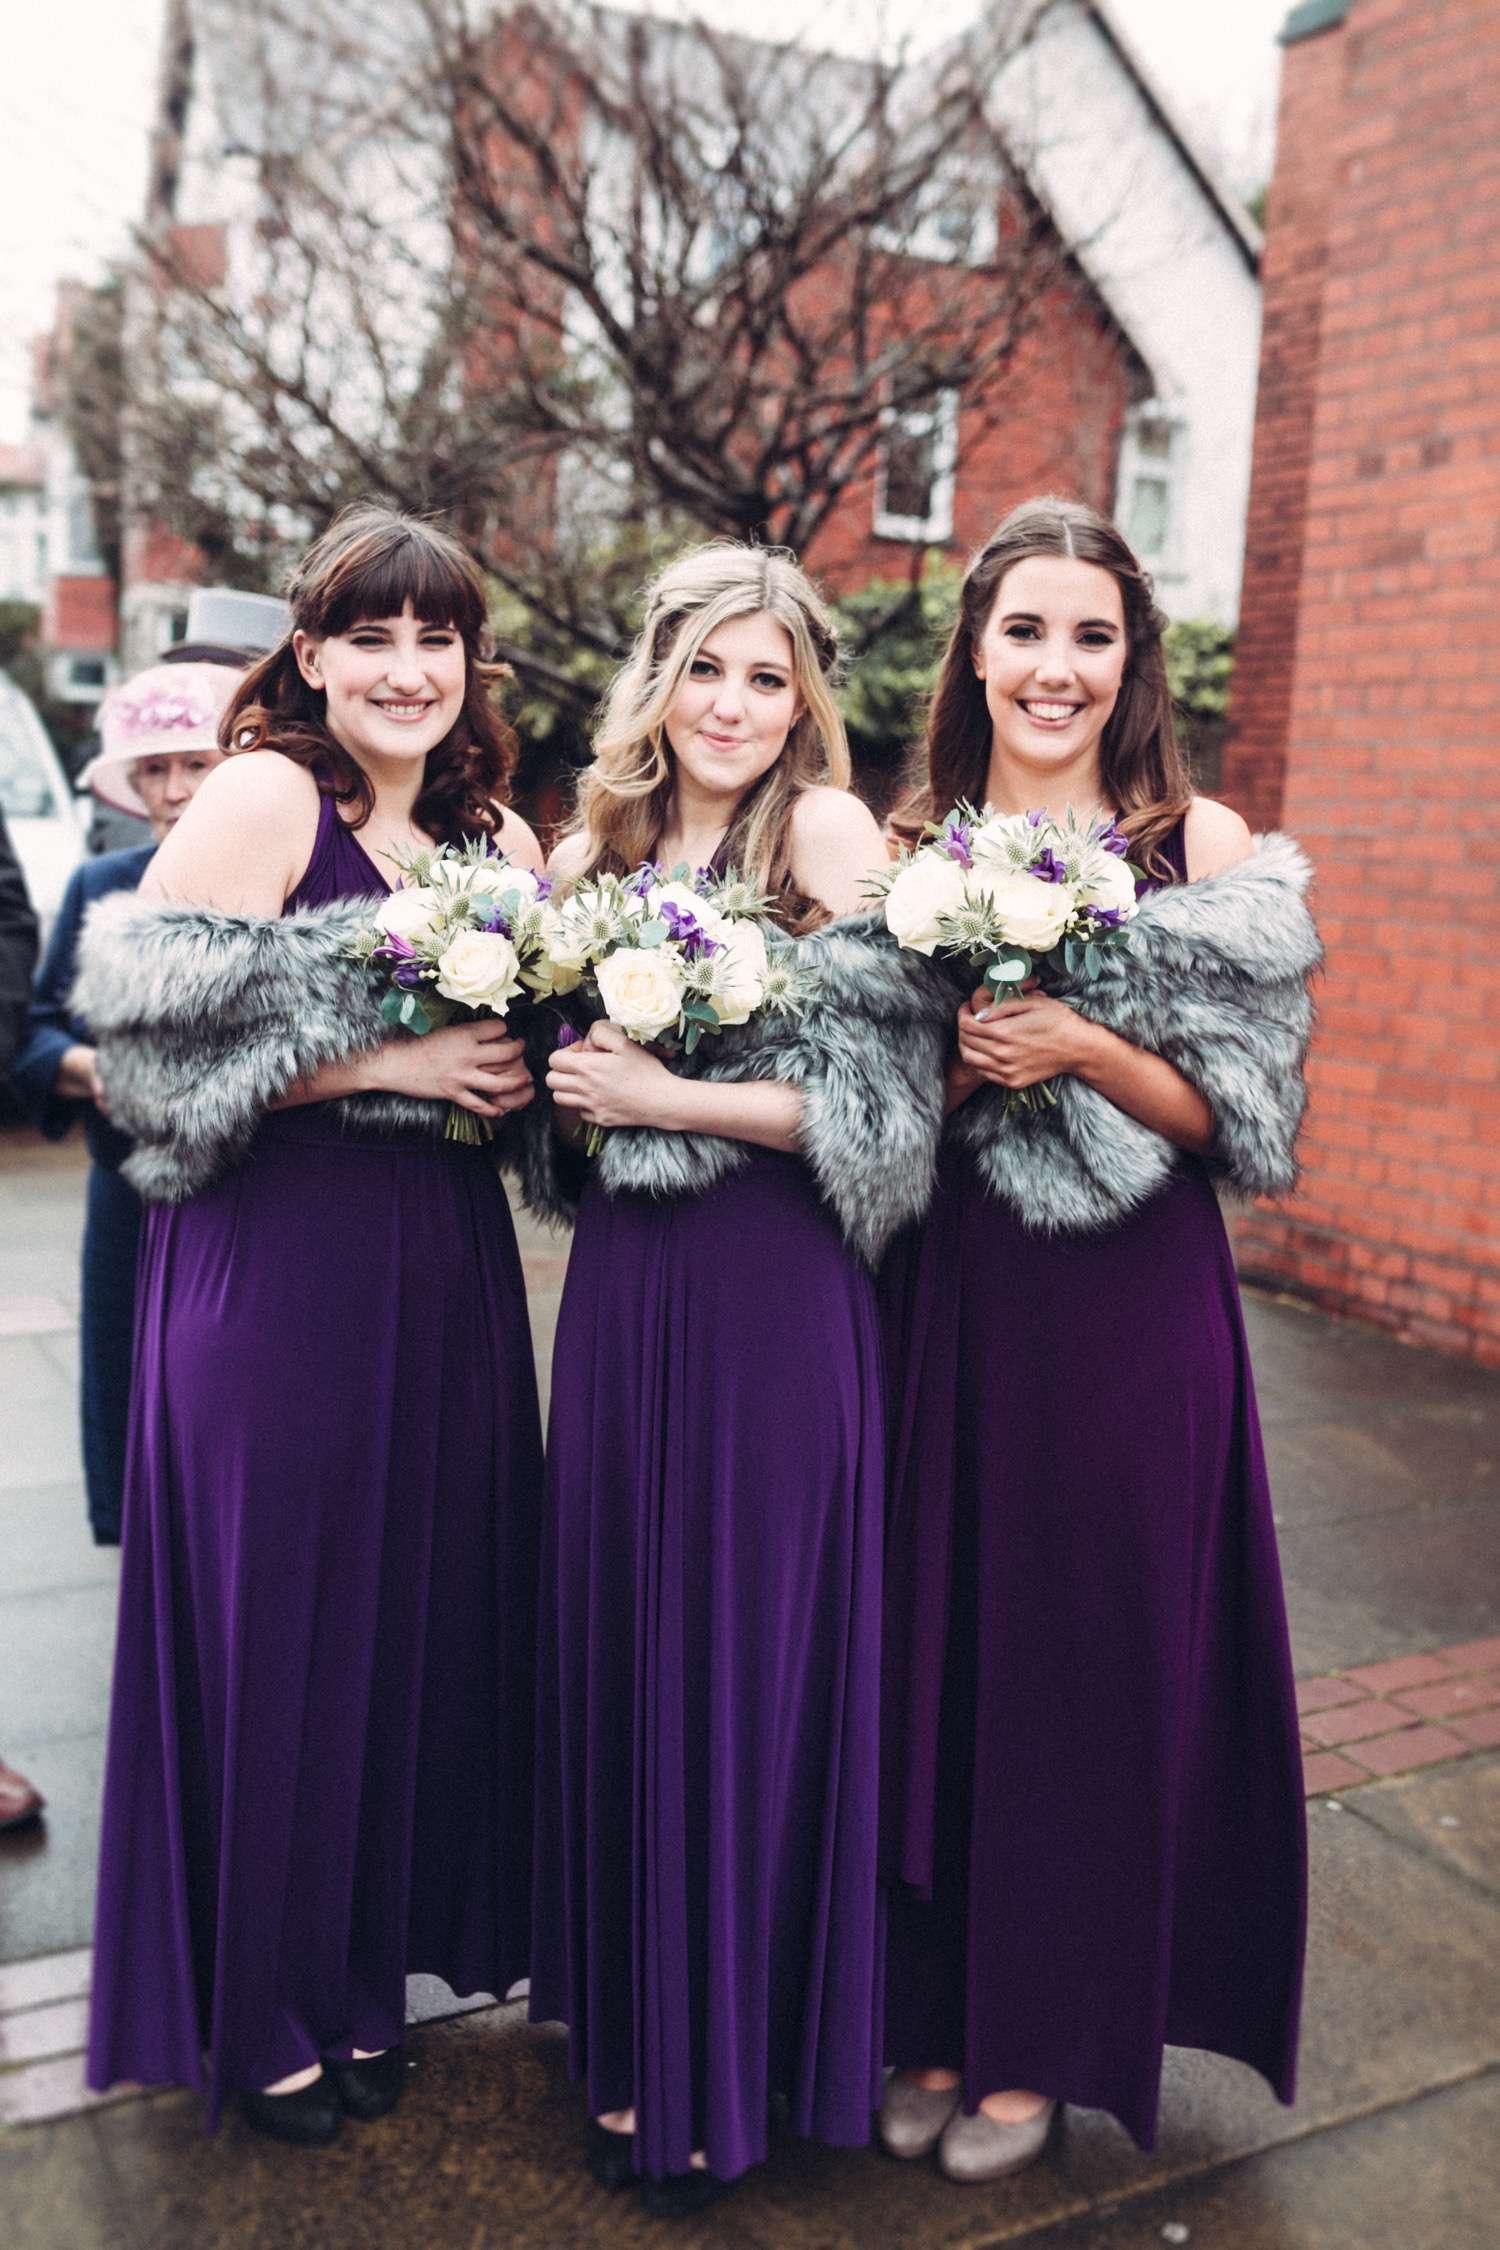 Eshott-Hall-Durham-Paul-Liddement-Wedding-Stories-19.jpg